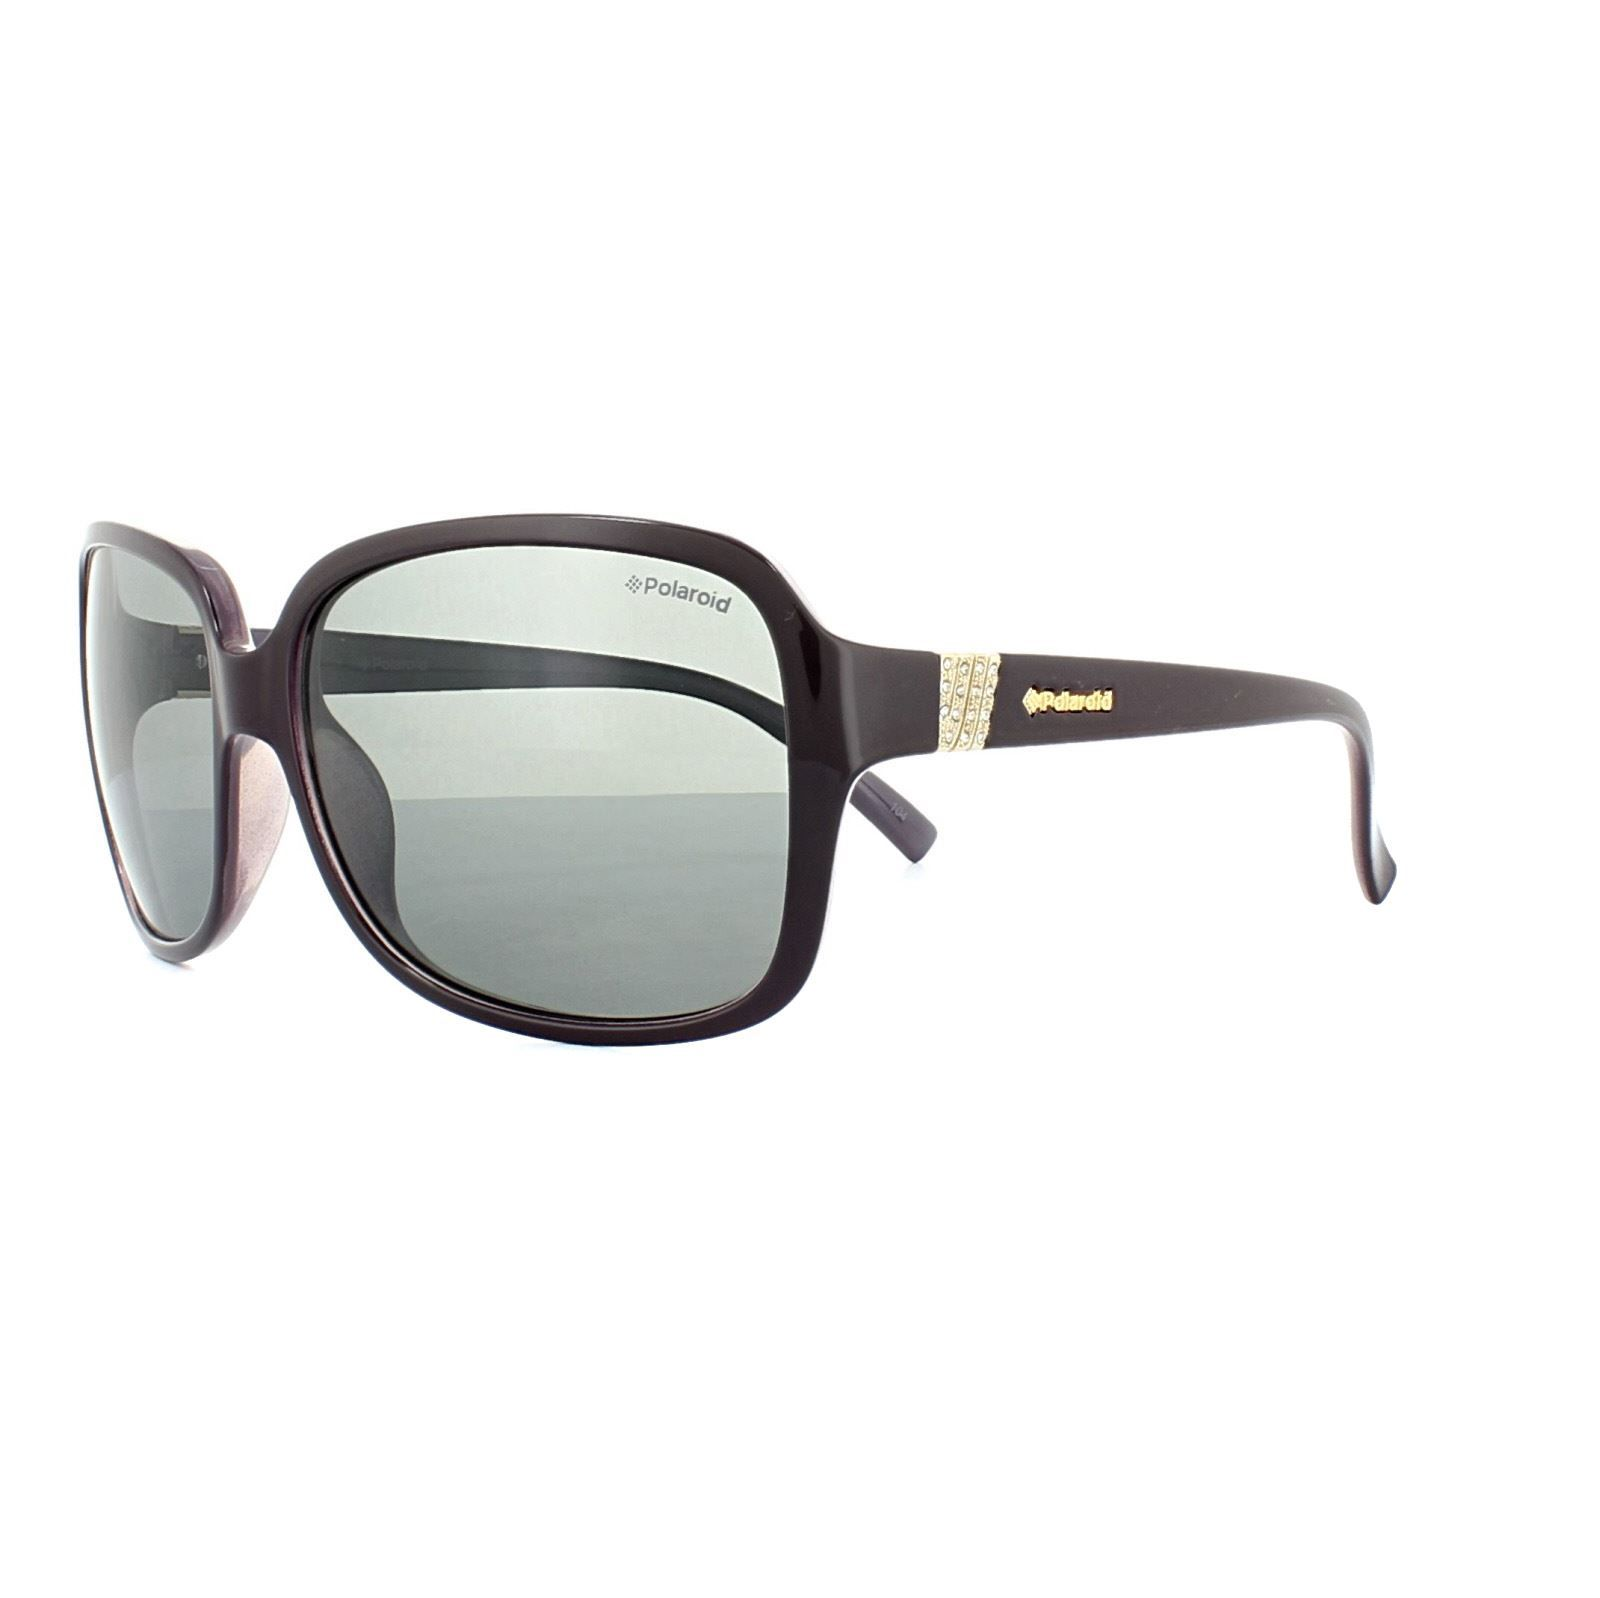 Polaroid Sunglasses 5006/S PUT AH Plum Lilac Grey Polarized